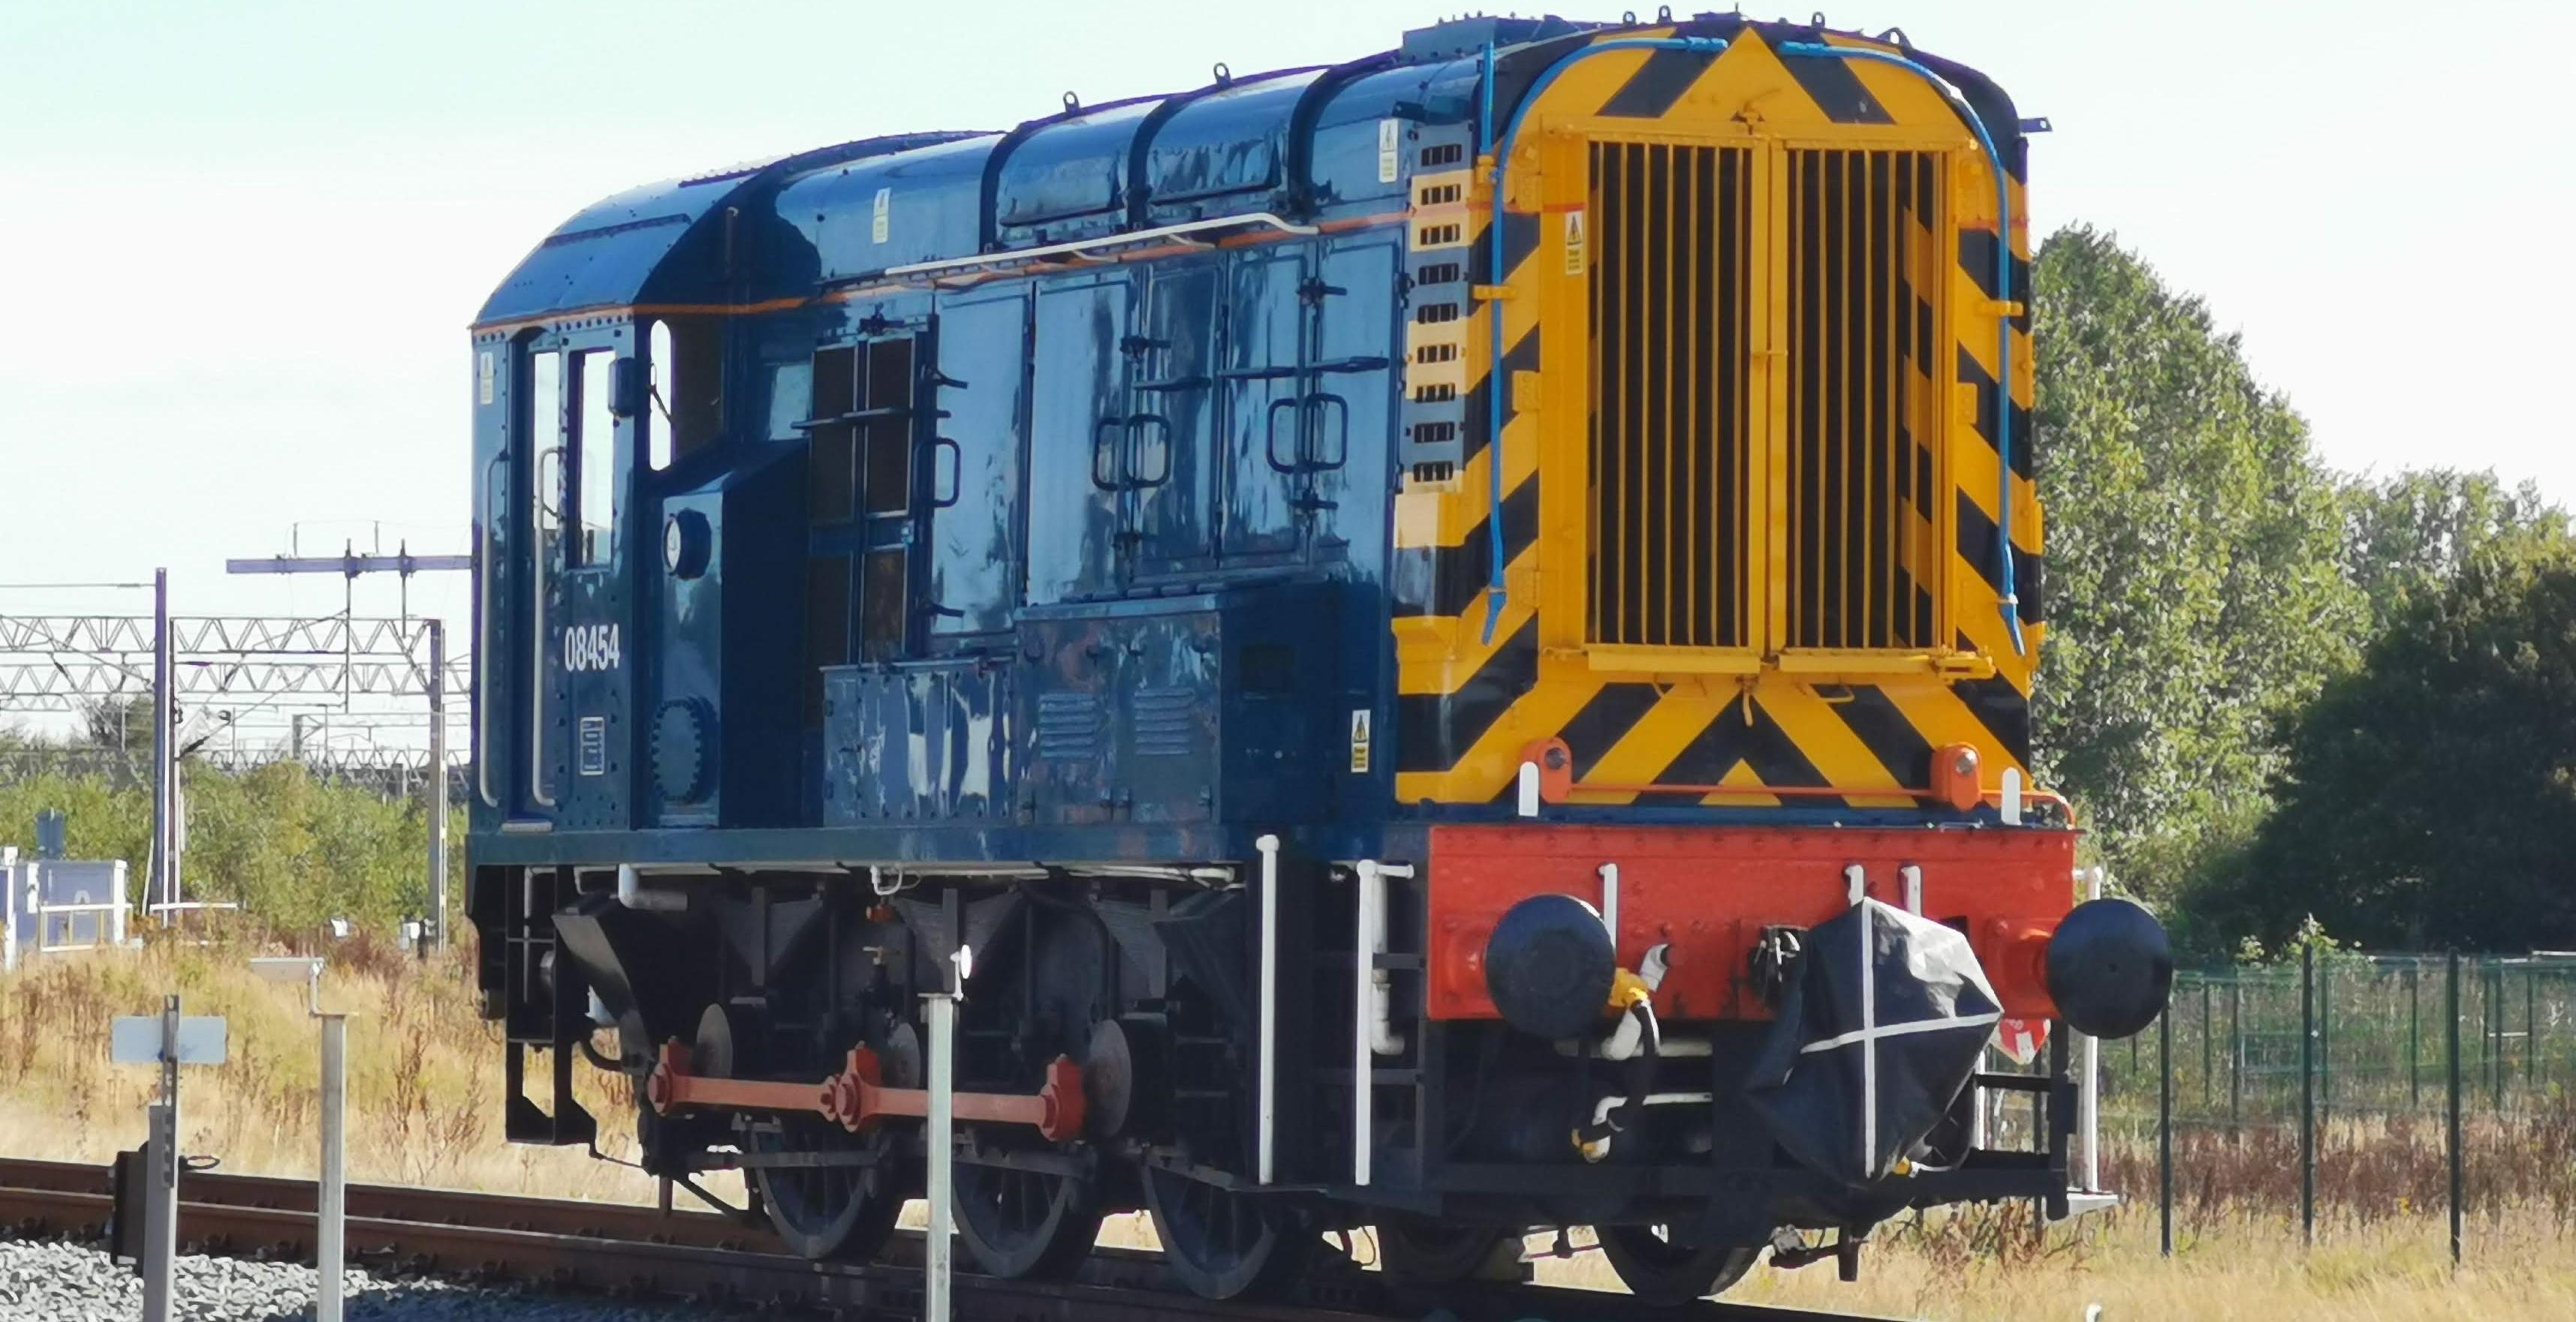 08454 at Alstom Widnes in September 2019. ©Hattons Model Railways